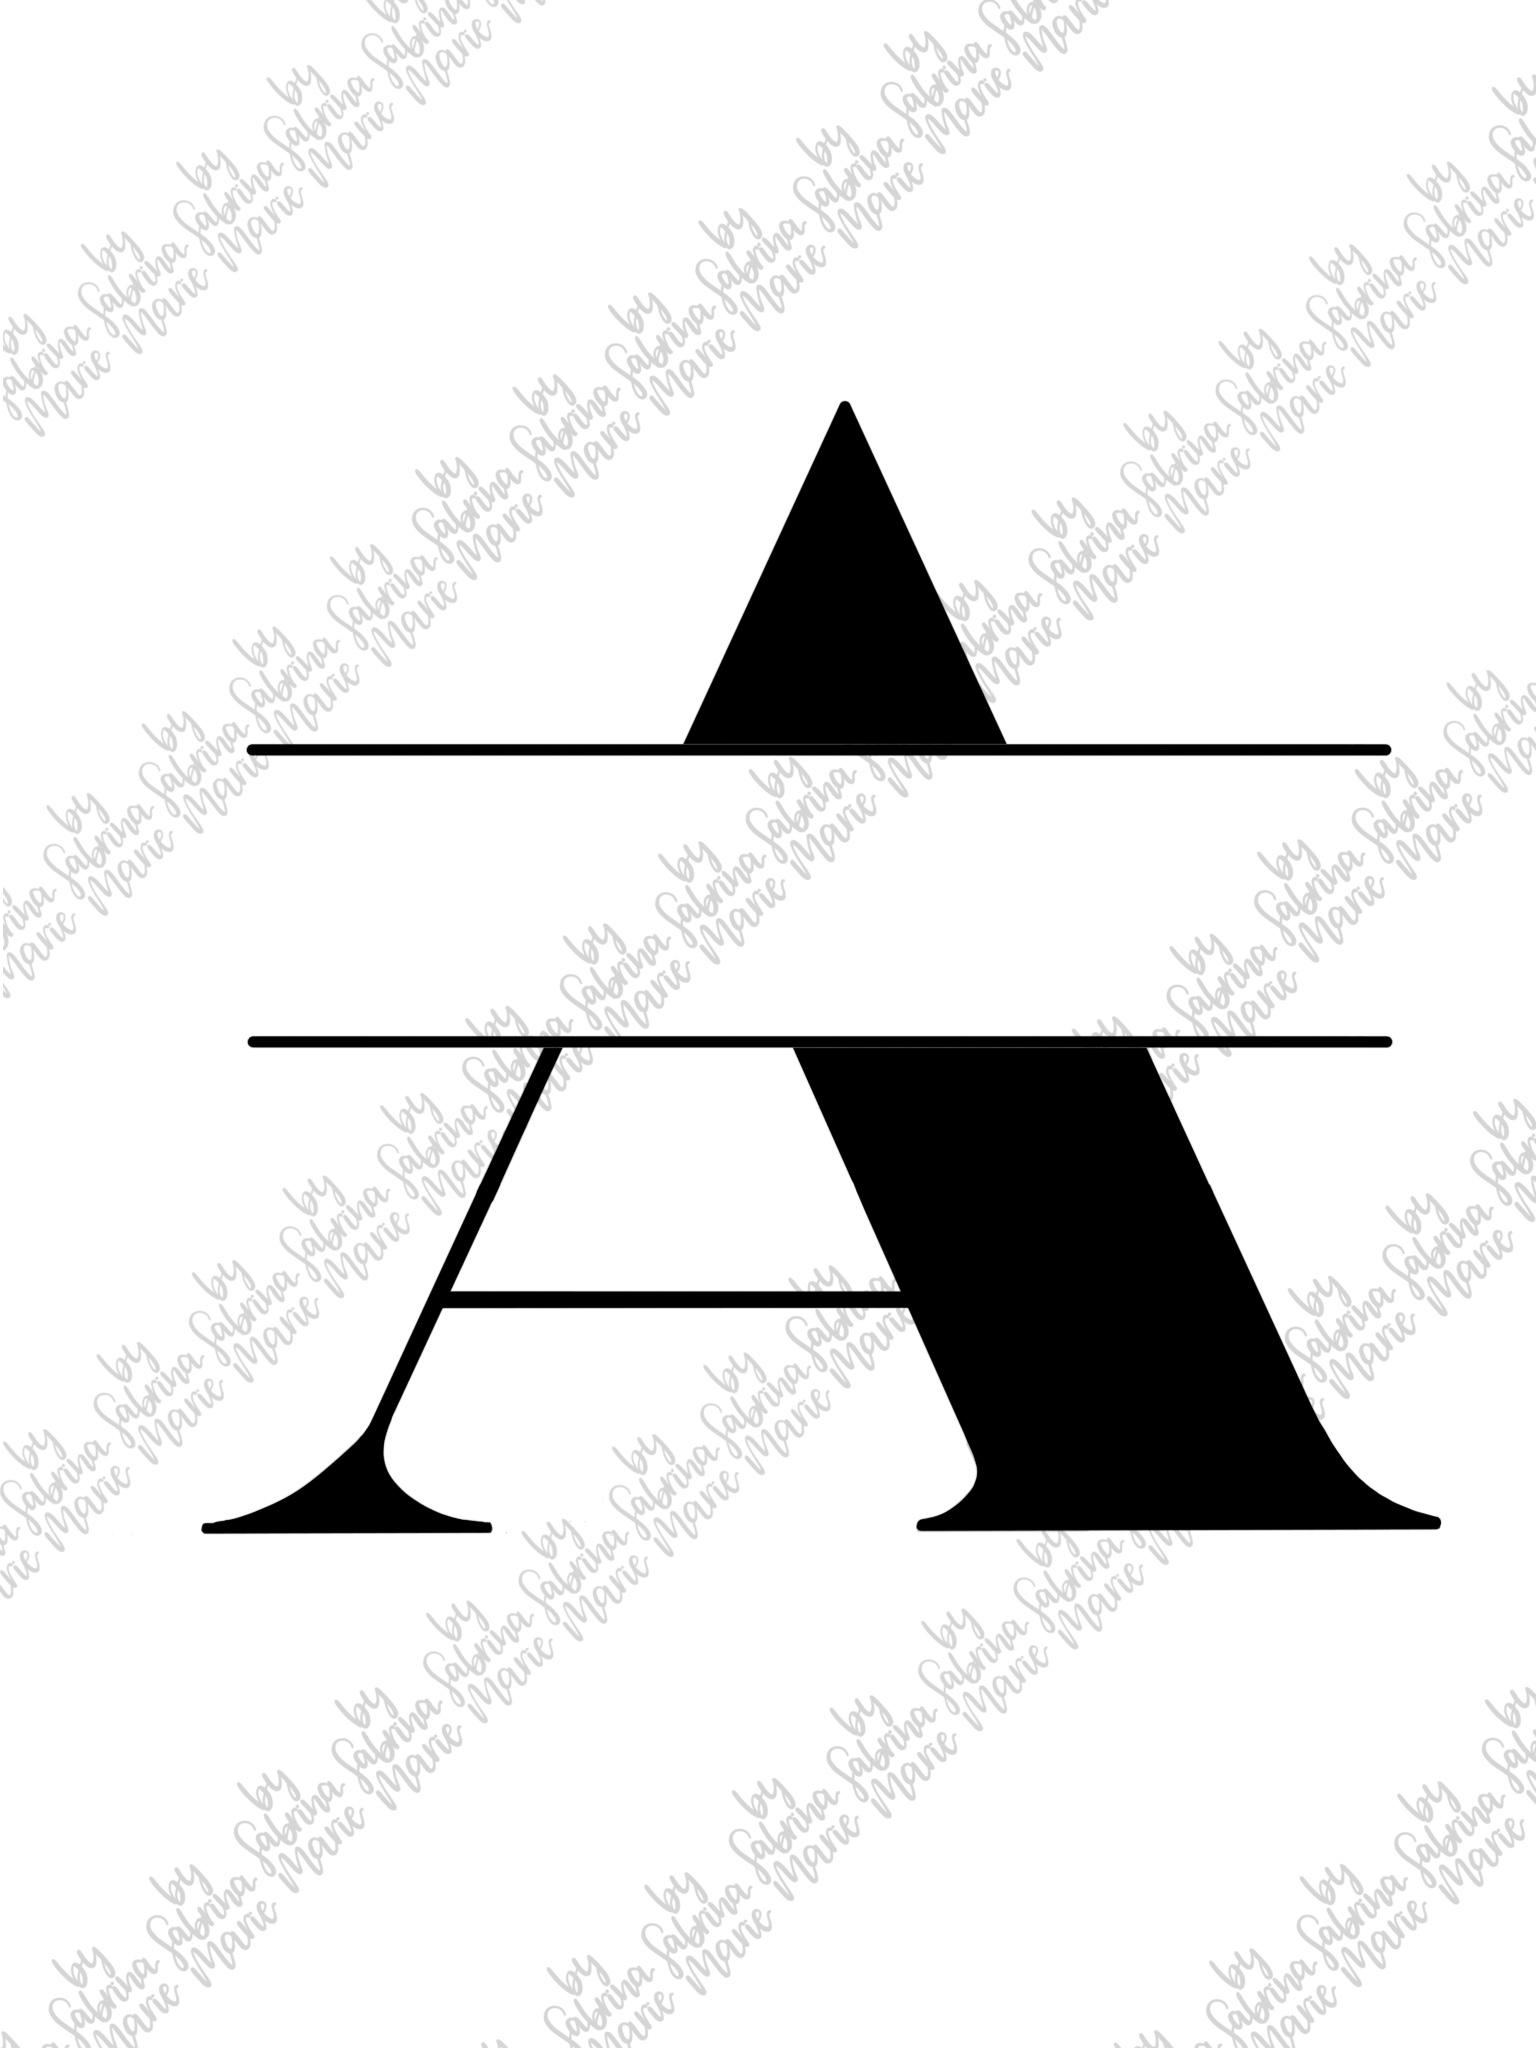 Split Monogram A - Handdrawn - SVG/PNG example image 2